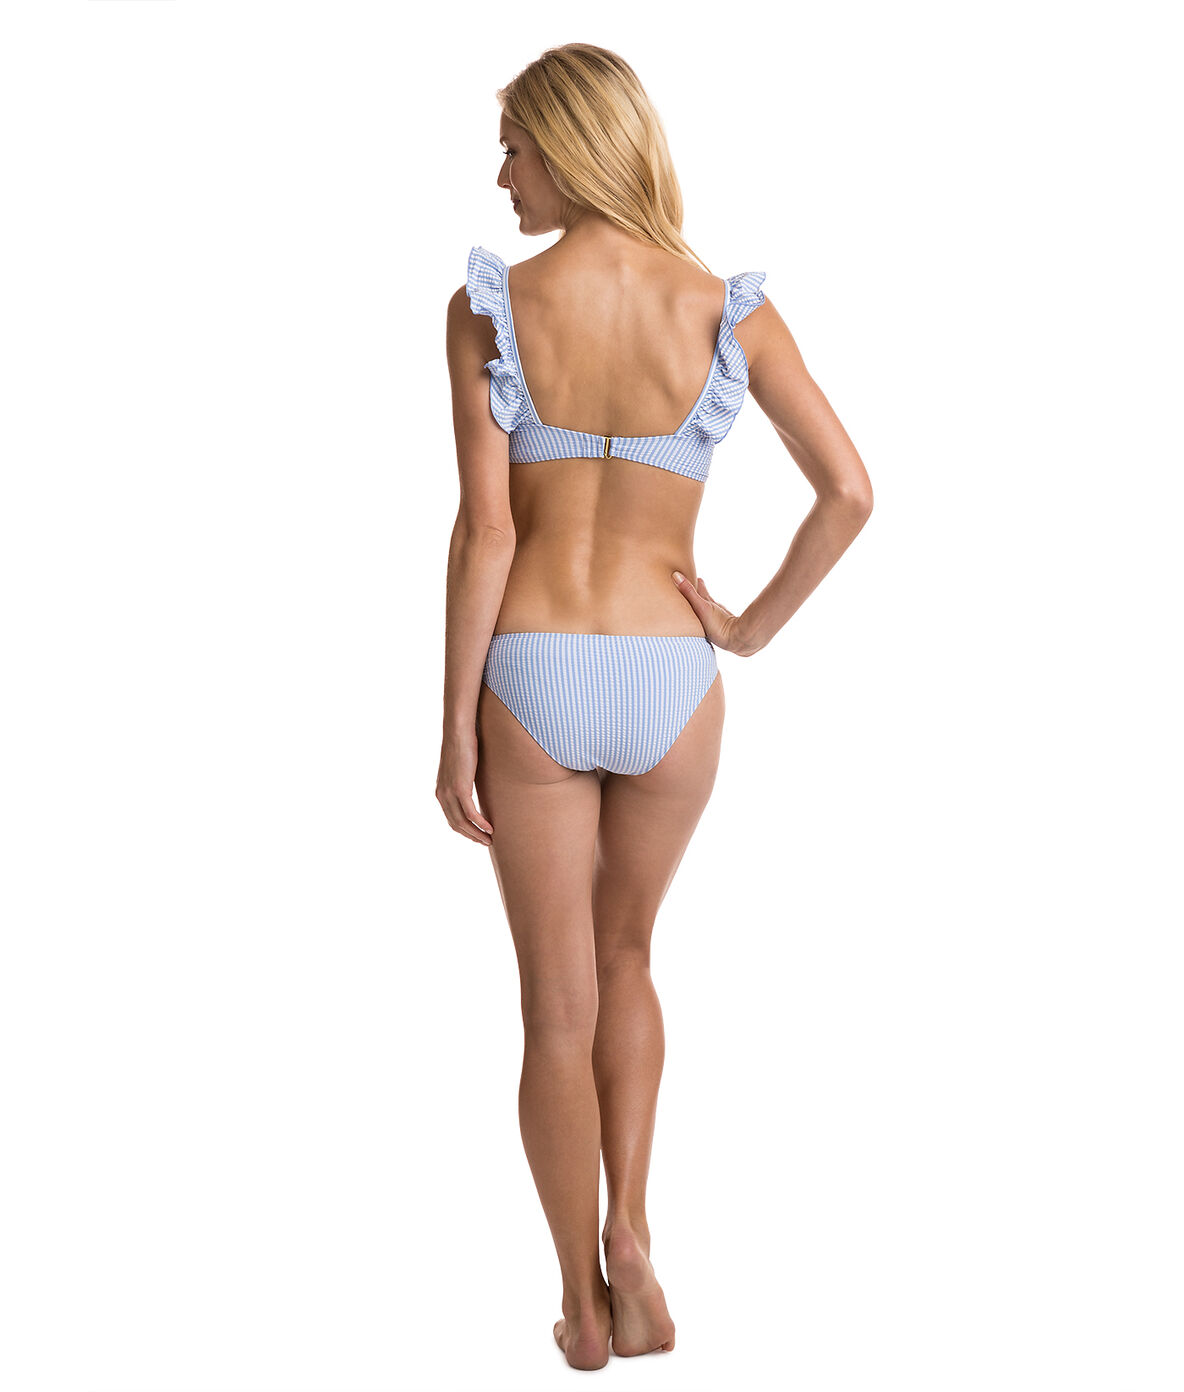 VINEYARD VINES Target BABY RUFFLE SCHOOL OF WHALES Top Bodysuit Swimsuit 3 mo